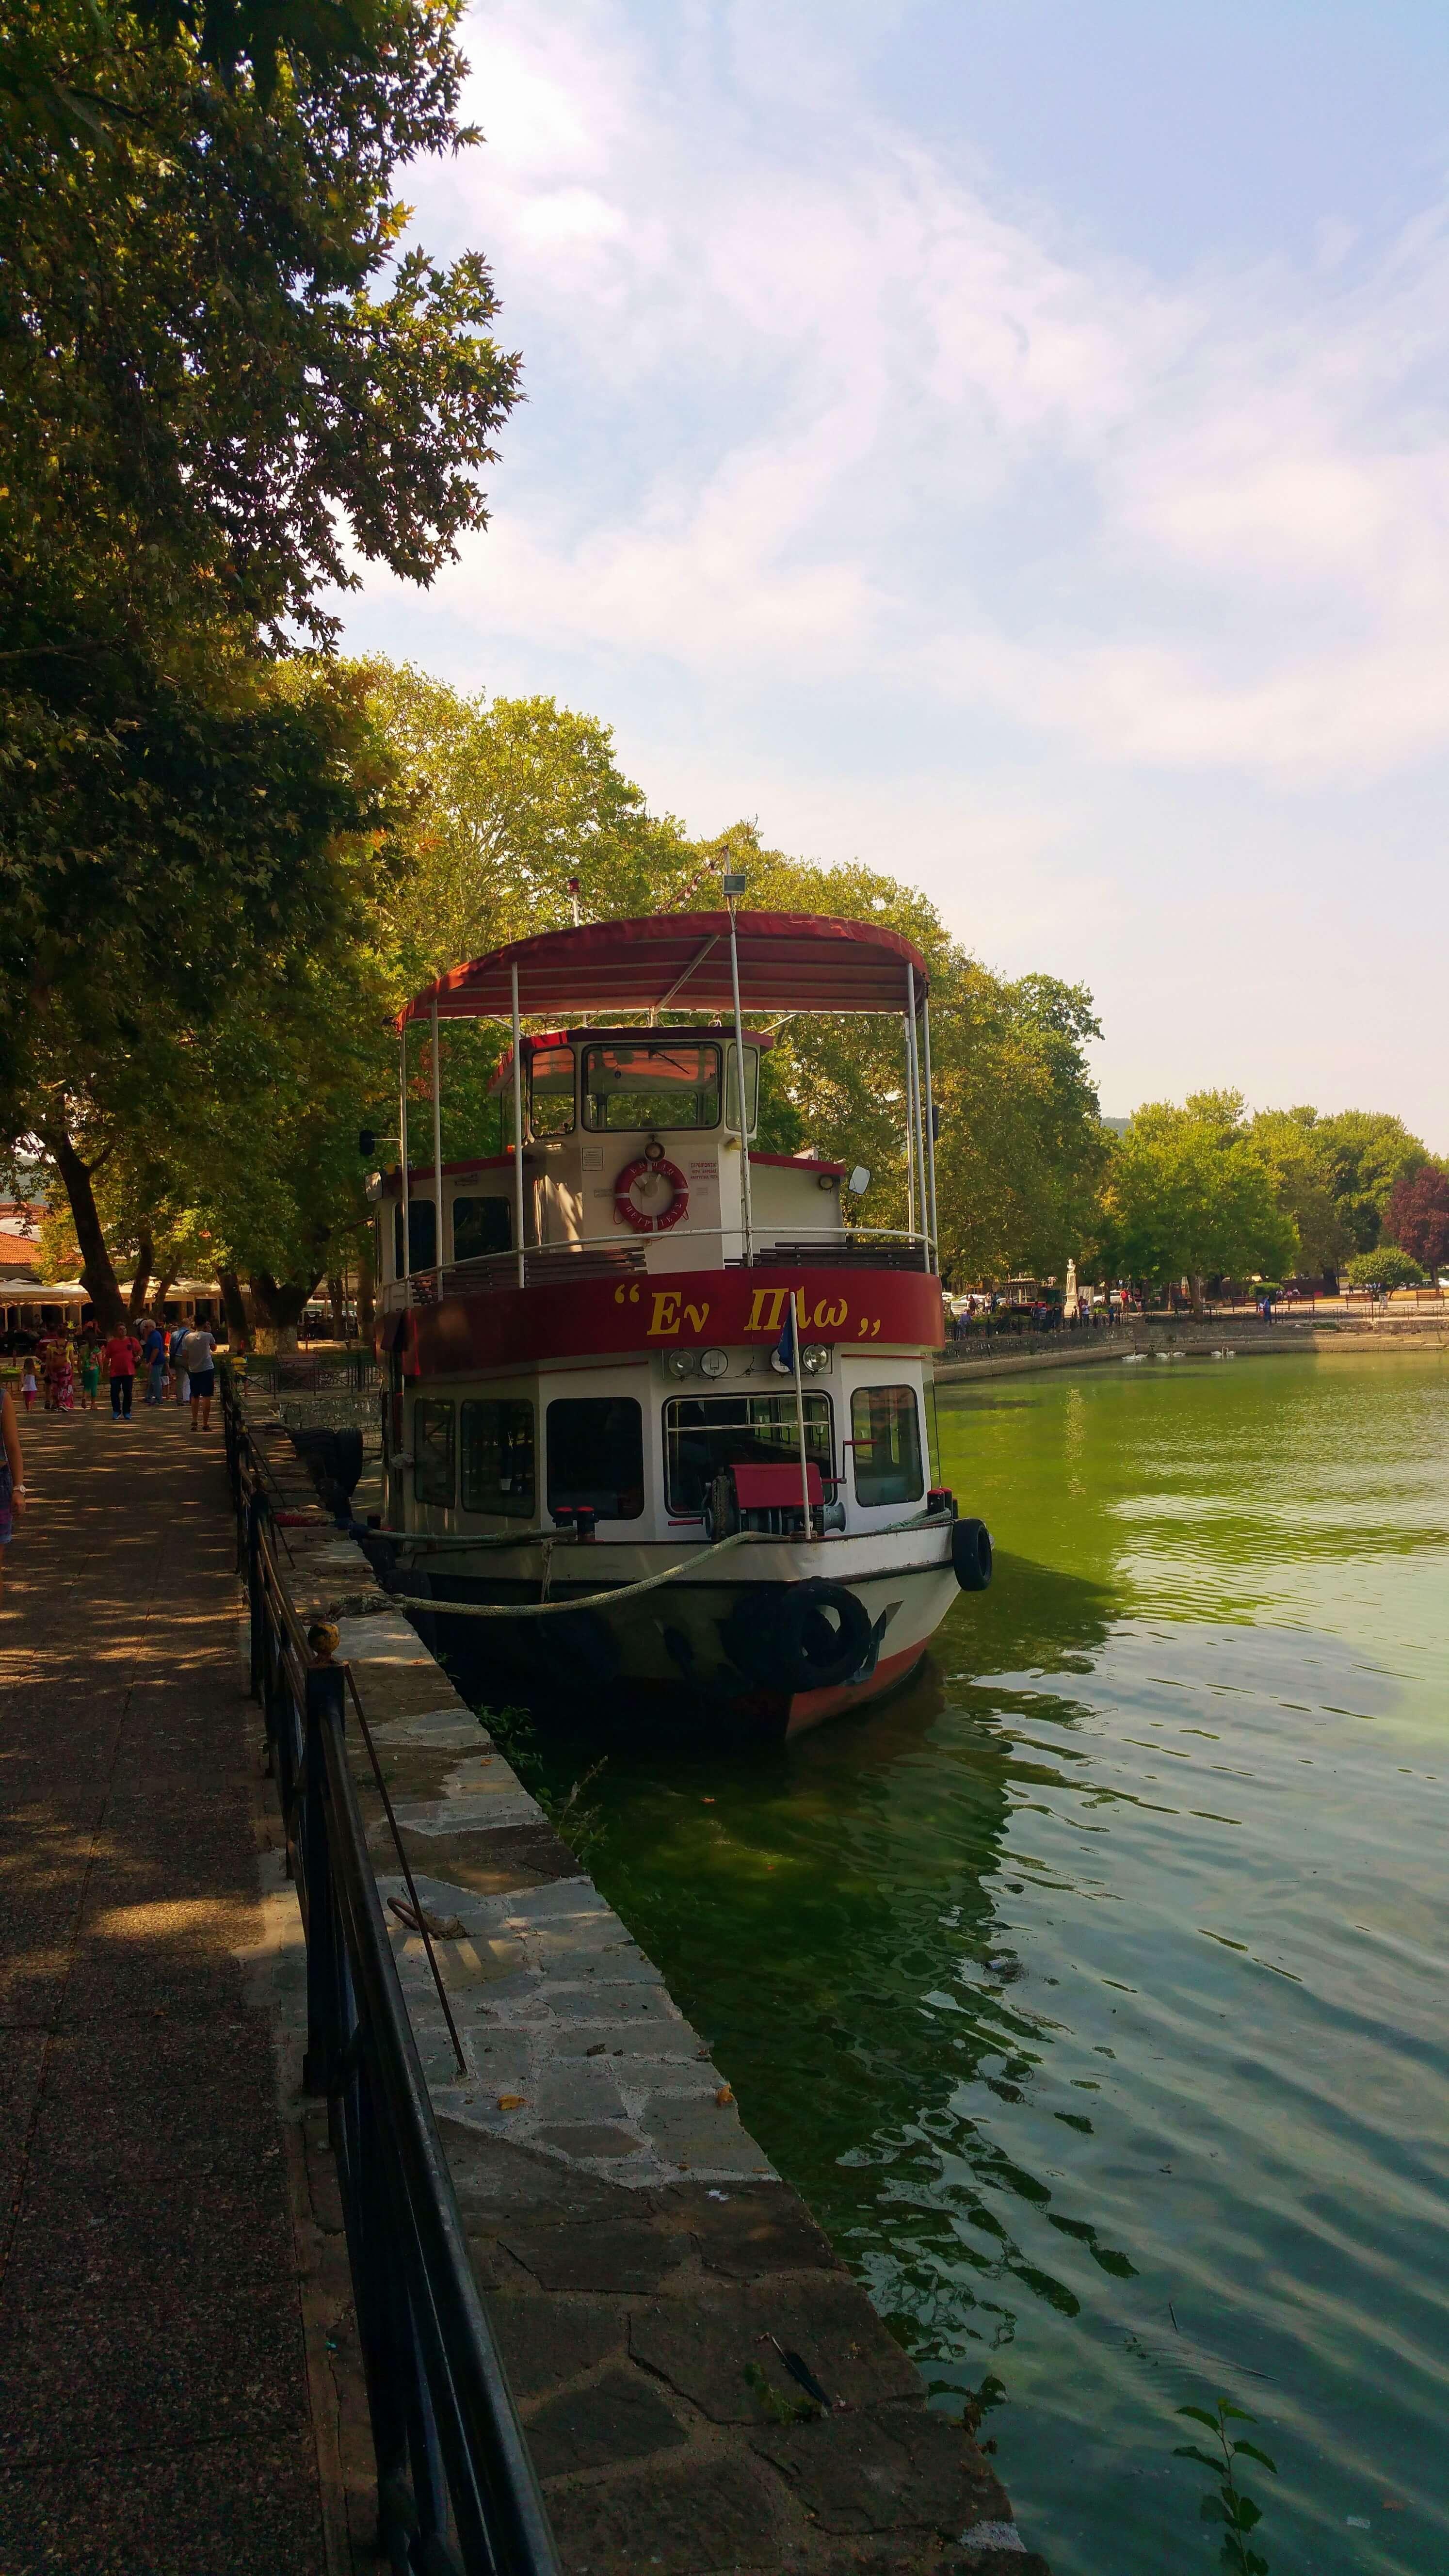 Ioannina Lake | Kicking Back the Pebbles